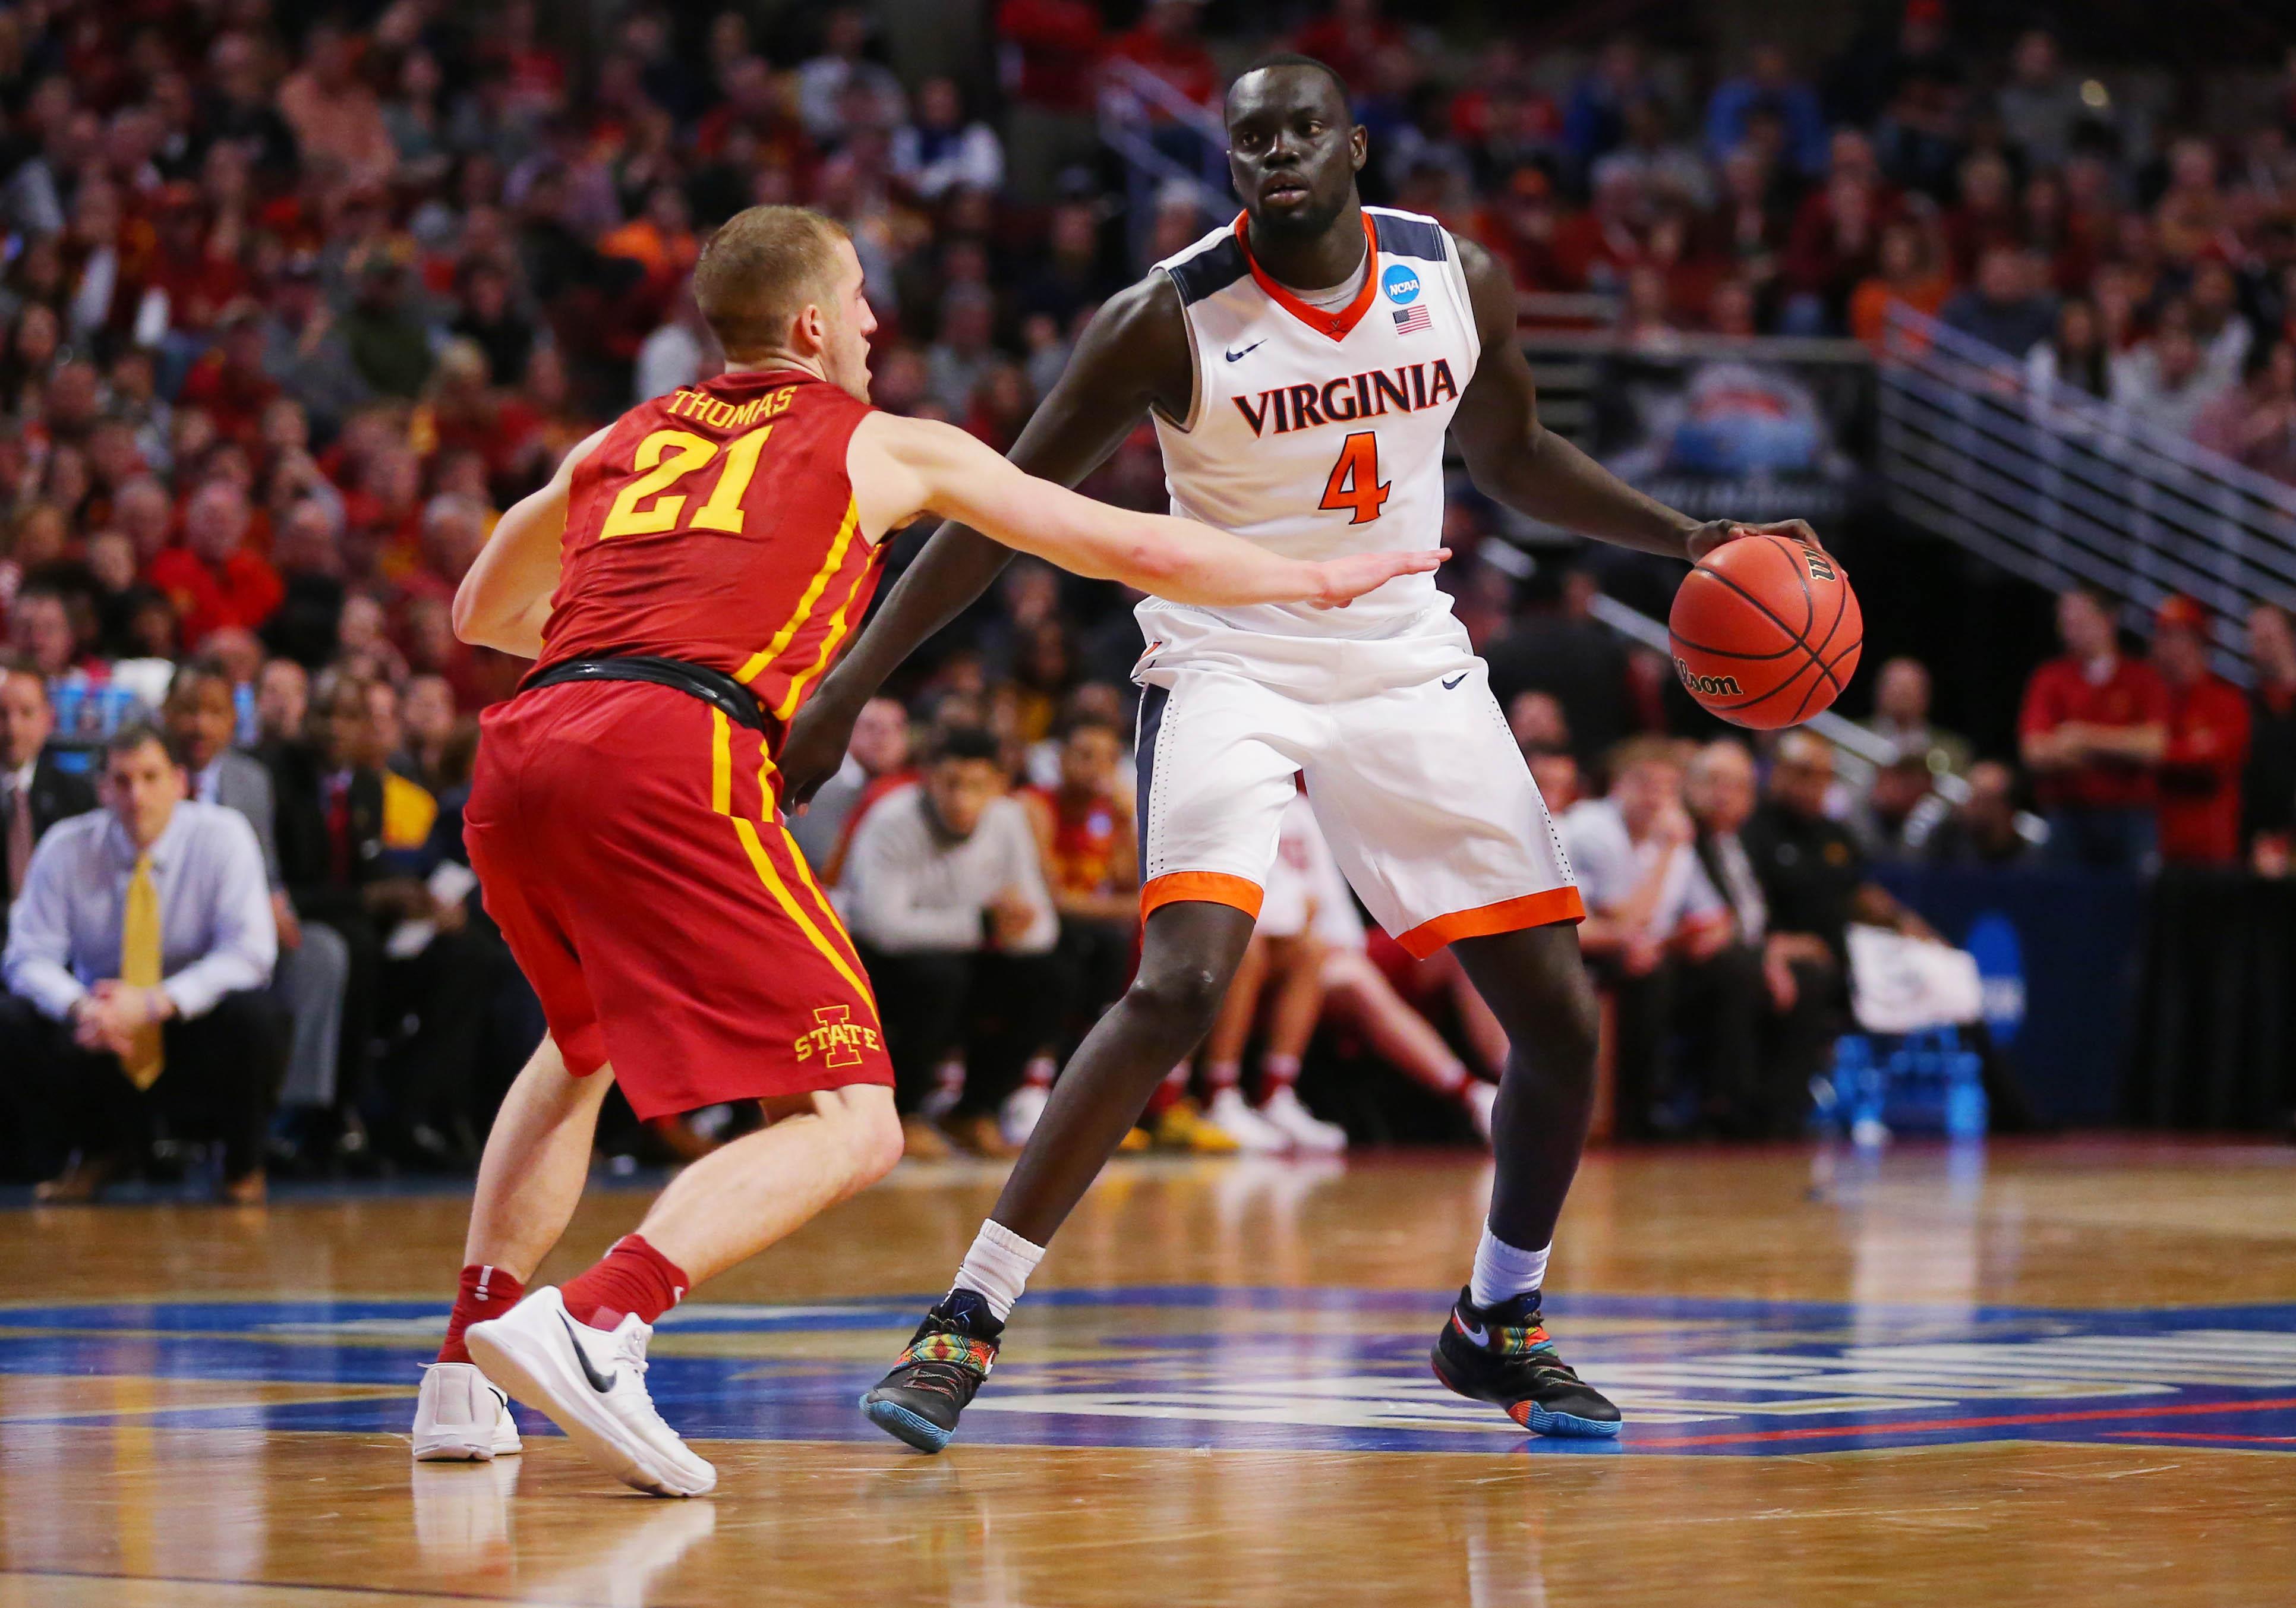 9211072-ncaa-basketball-ncaa-tournament-midwest-regional-iowa-state-vs-virginia